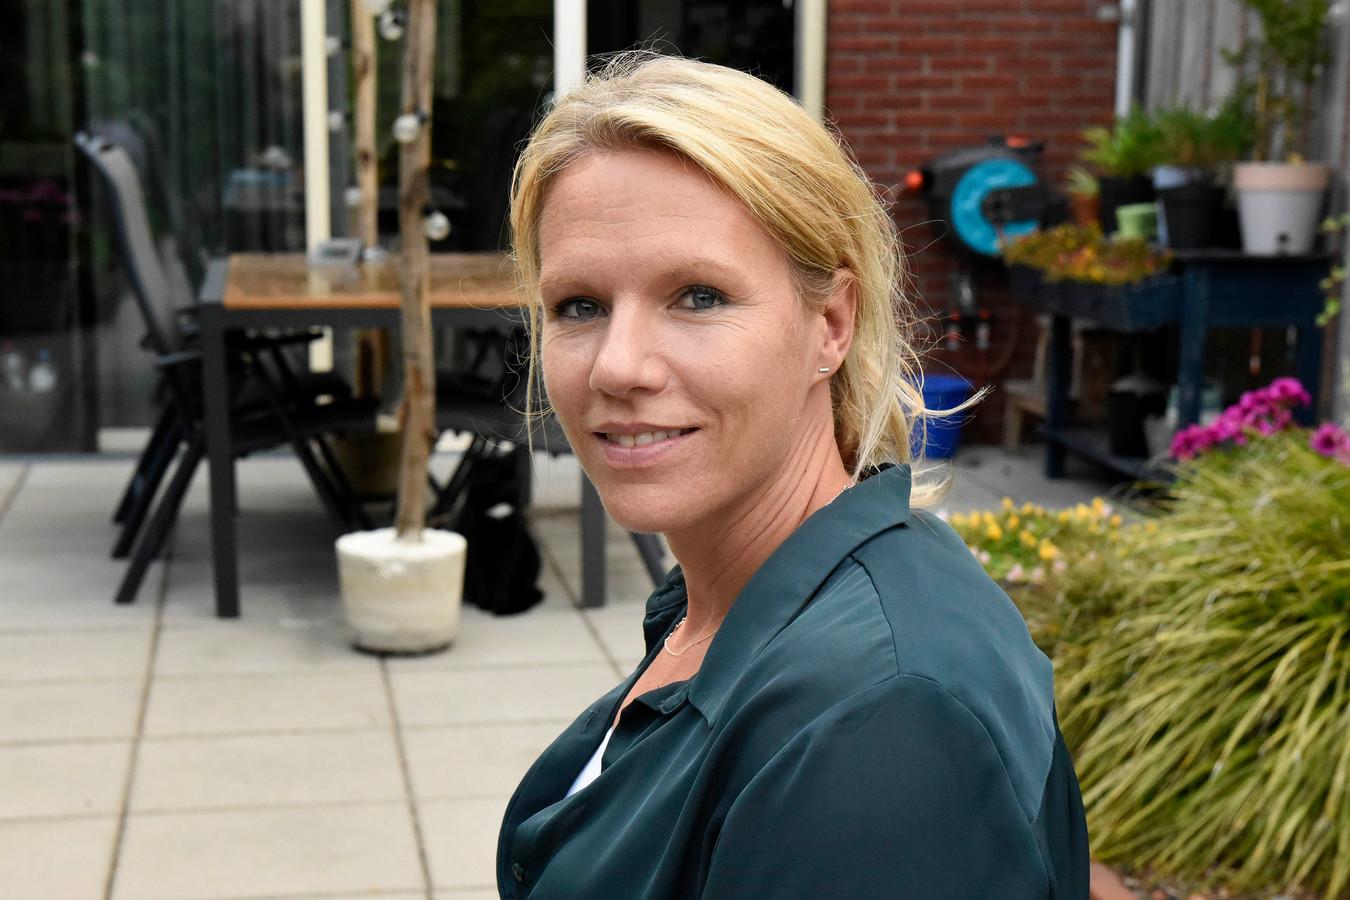 Rolstoeltennisster Esther Vergeer (38)